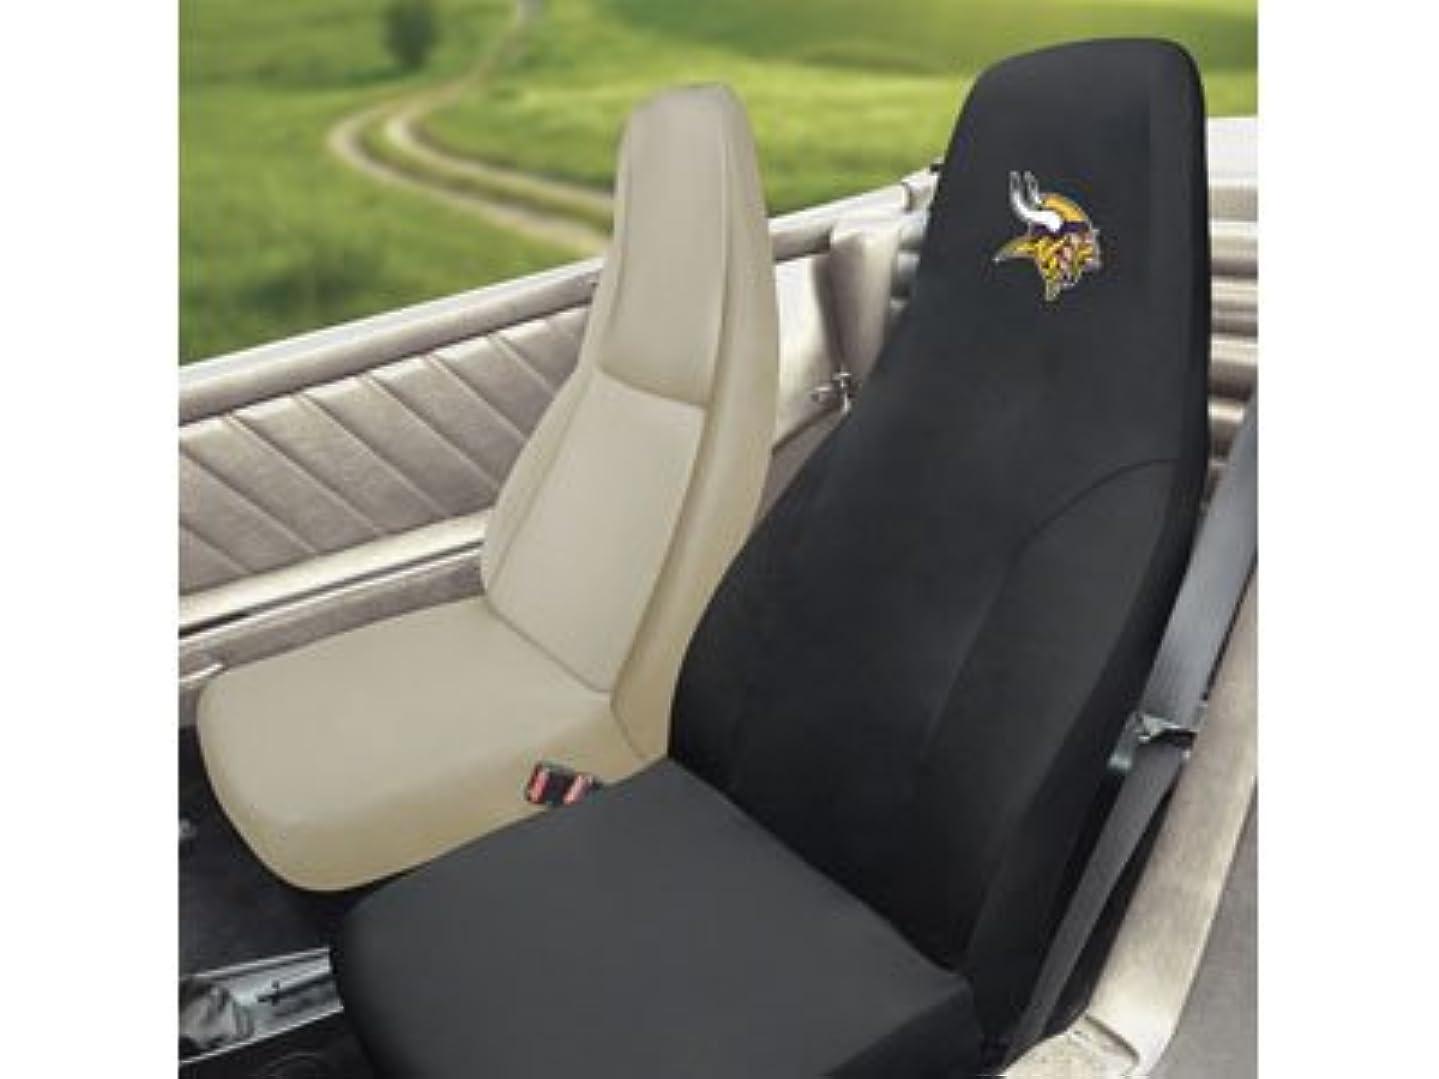 FANMATS 21558 Seat Cover NFL (Minnesota Vikings)